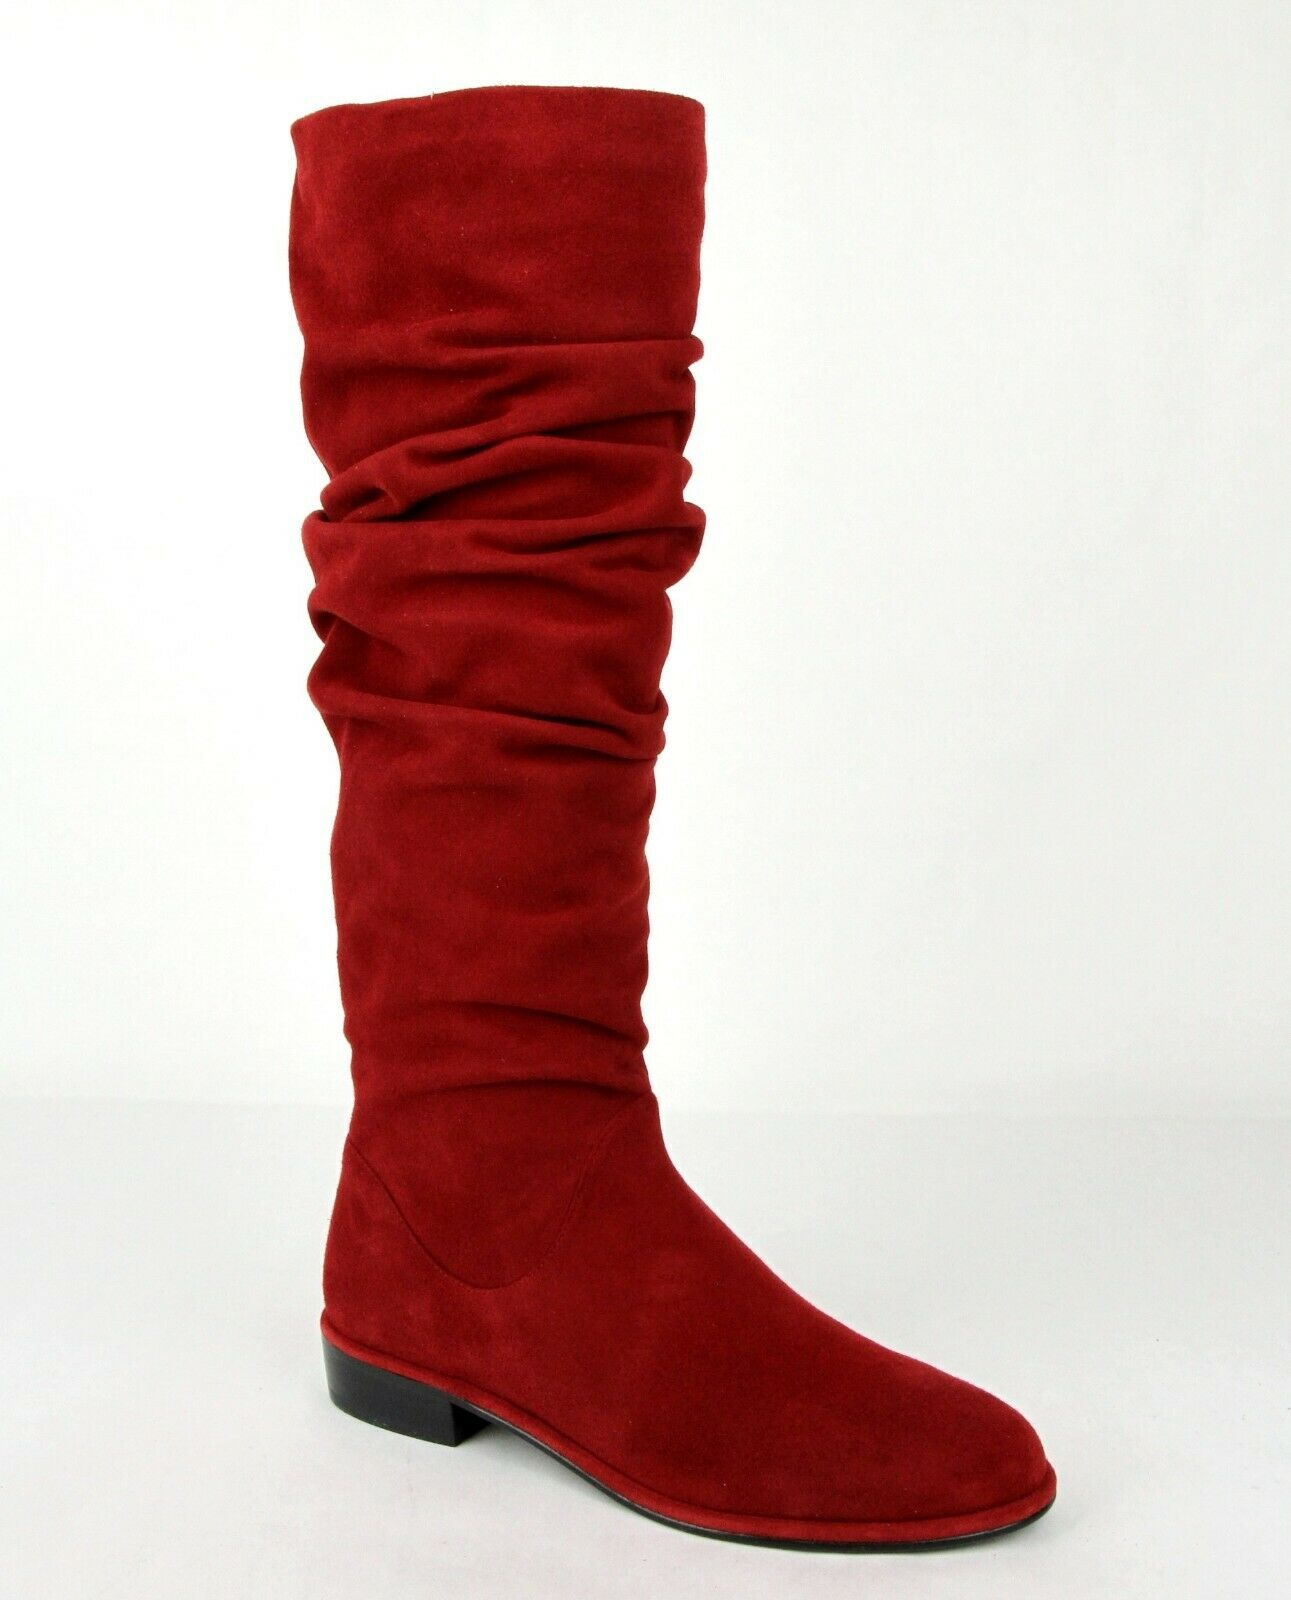 Stuart Weitzman Mujer flatscrunchy Scarlet Rojo Gamuza botas Hasta La Rodilla